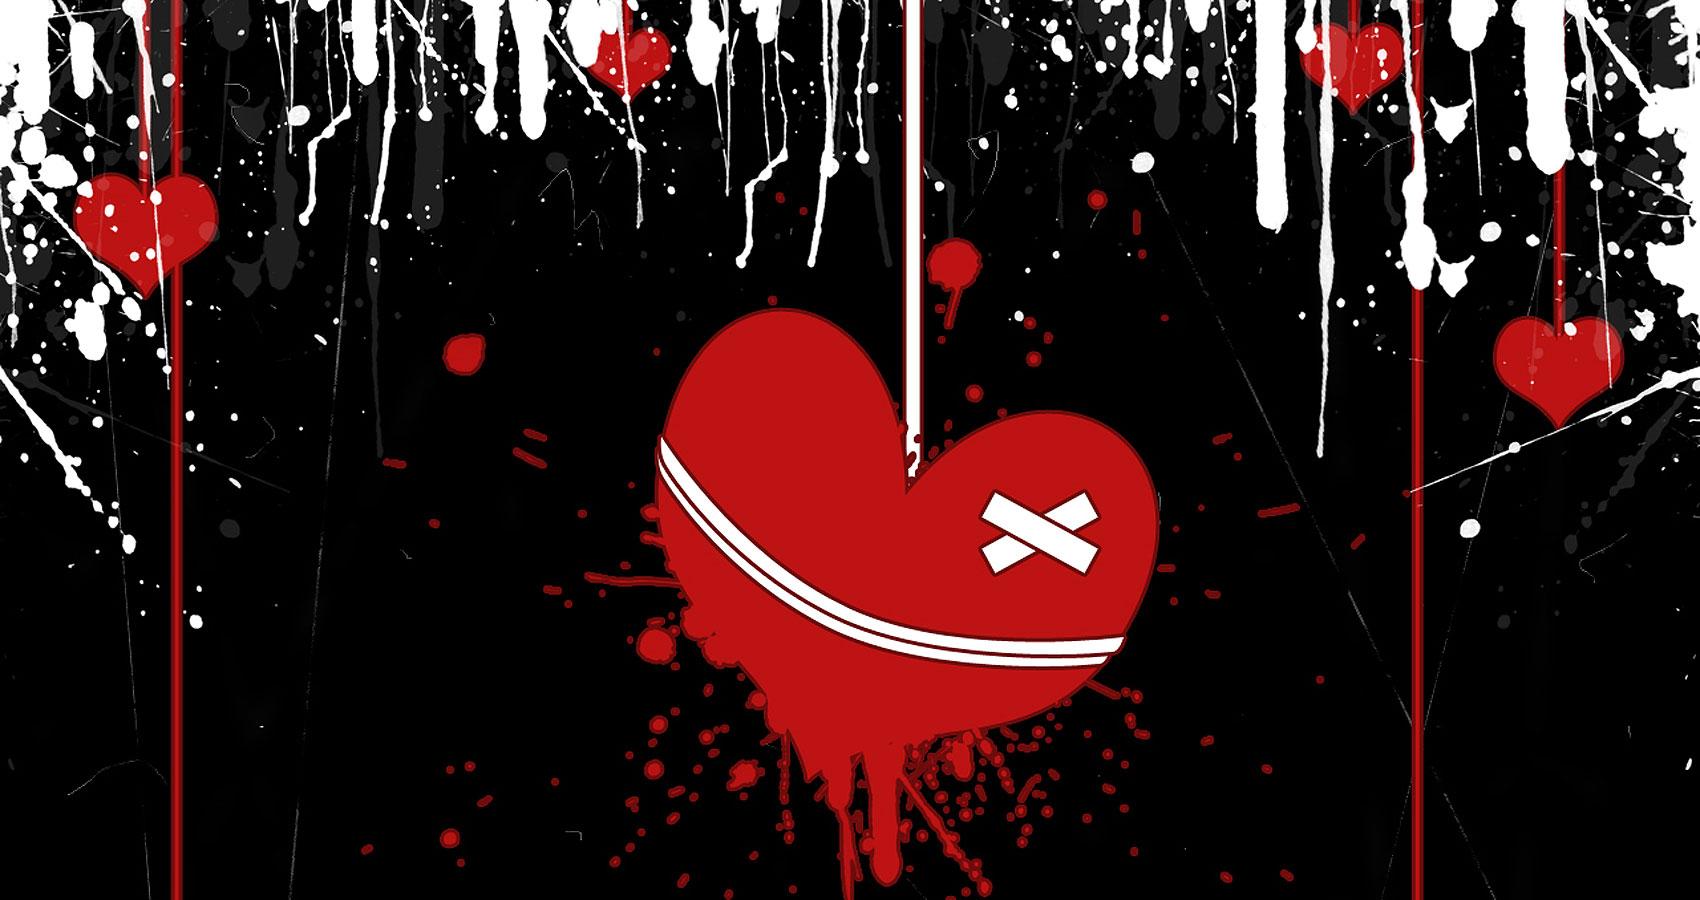 Deception, by Seorin Kae at Spillwords.com